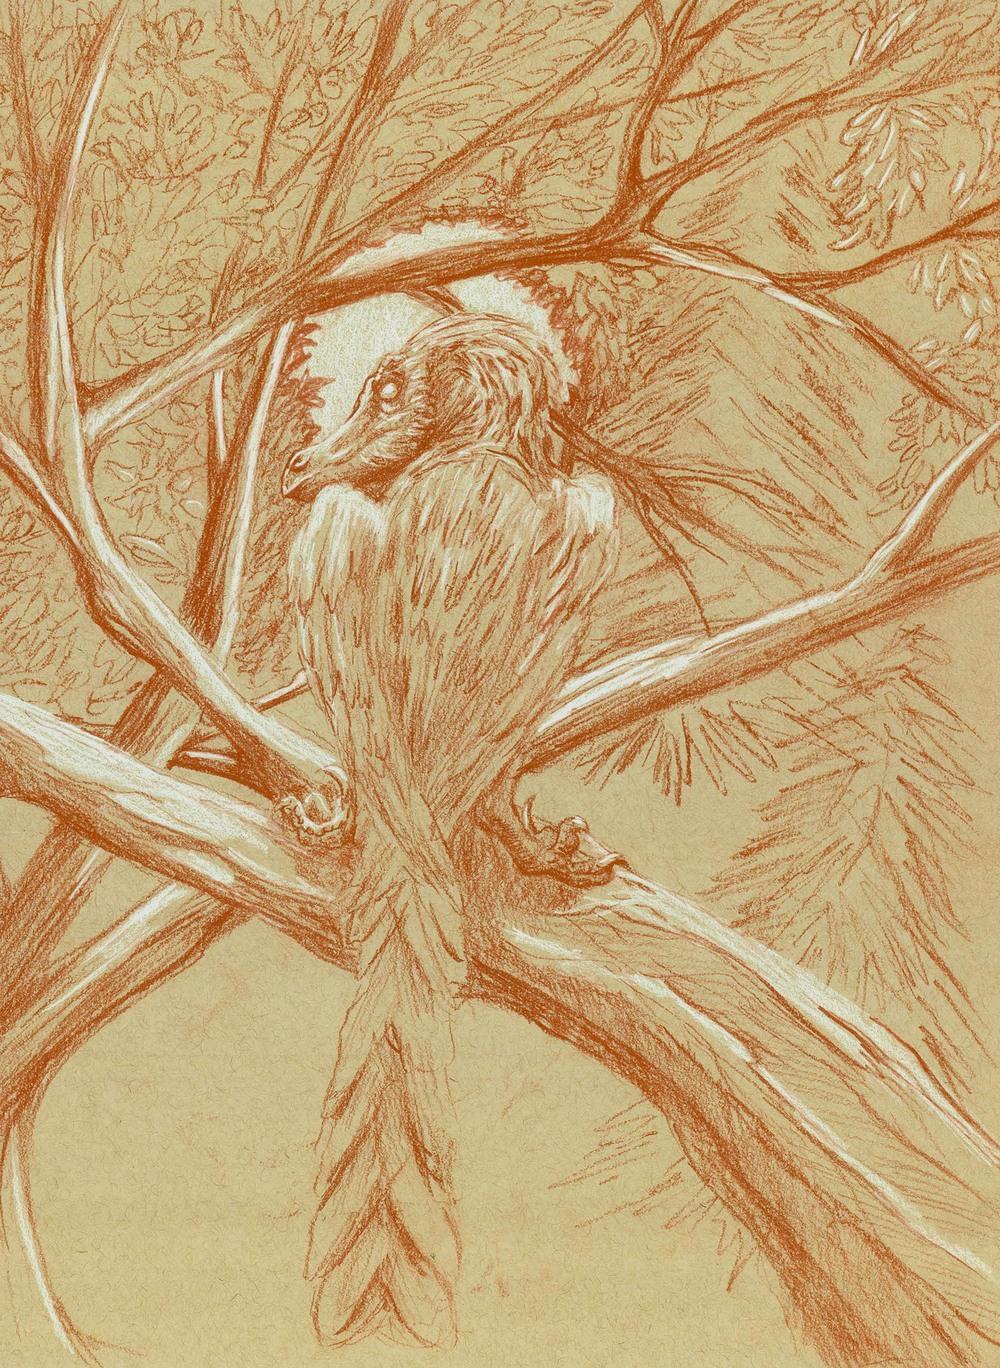 velociraptor study.jpg